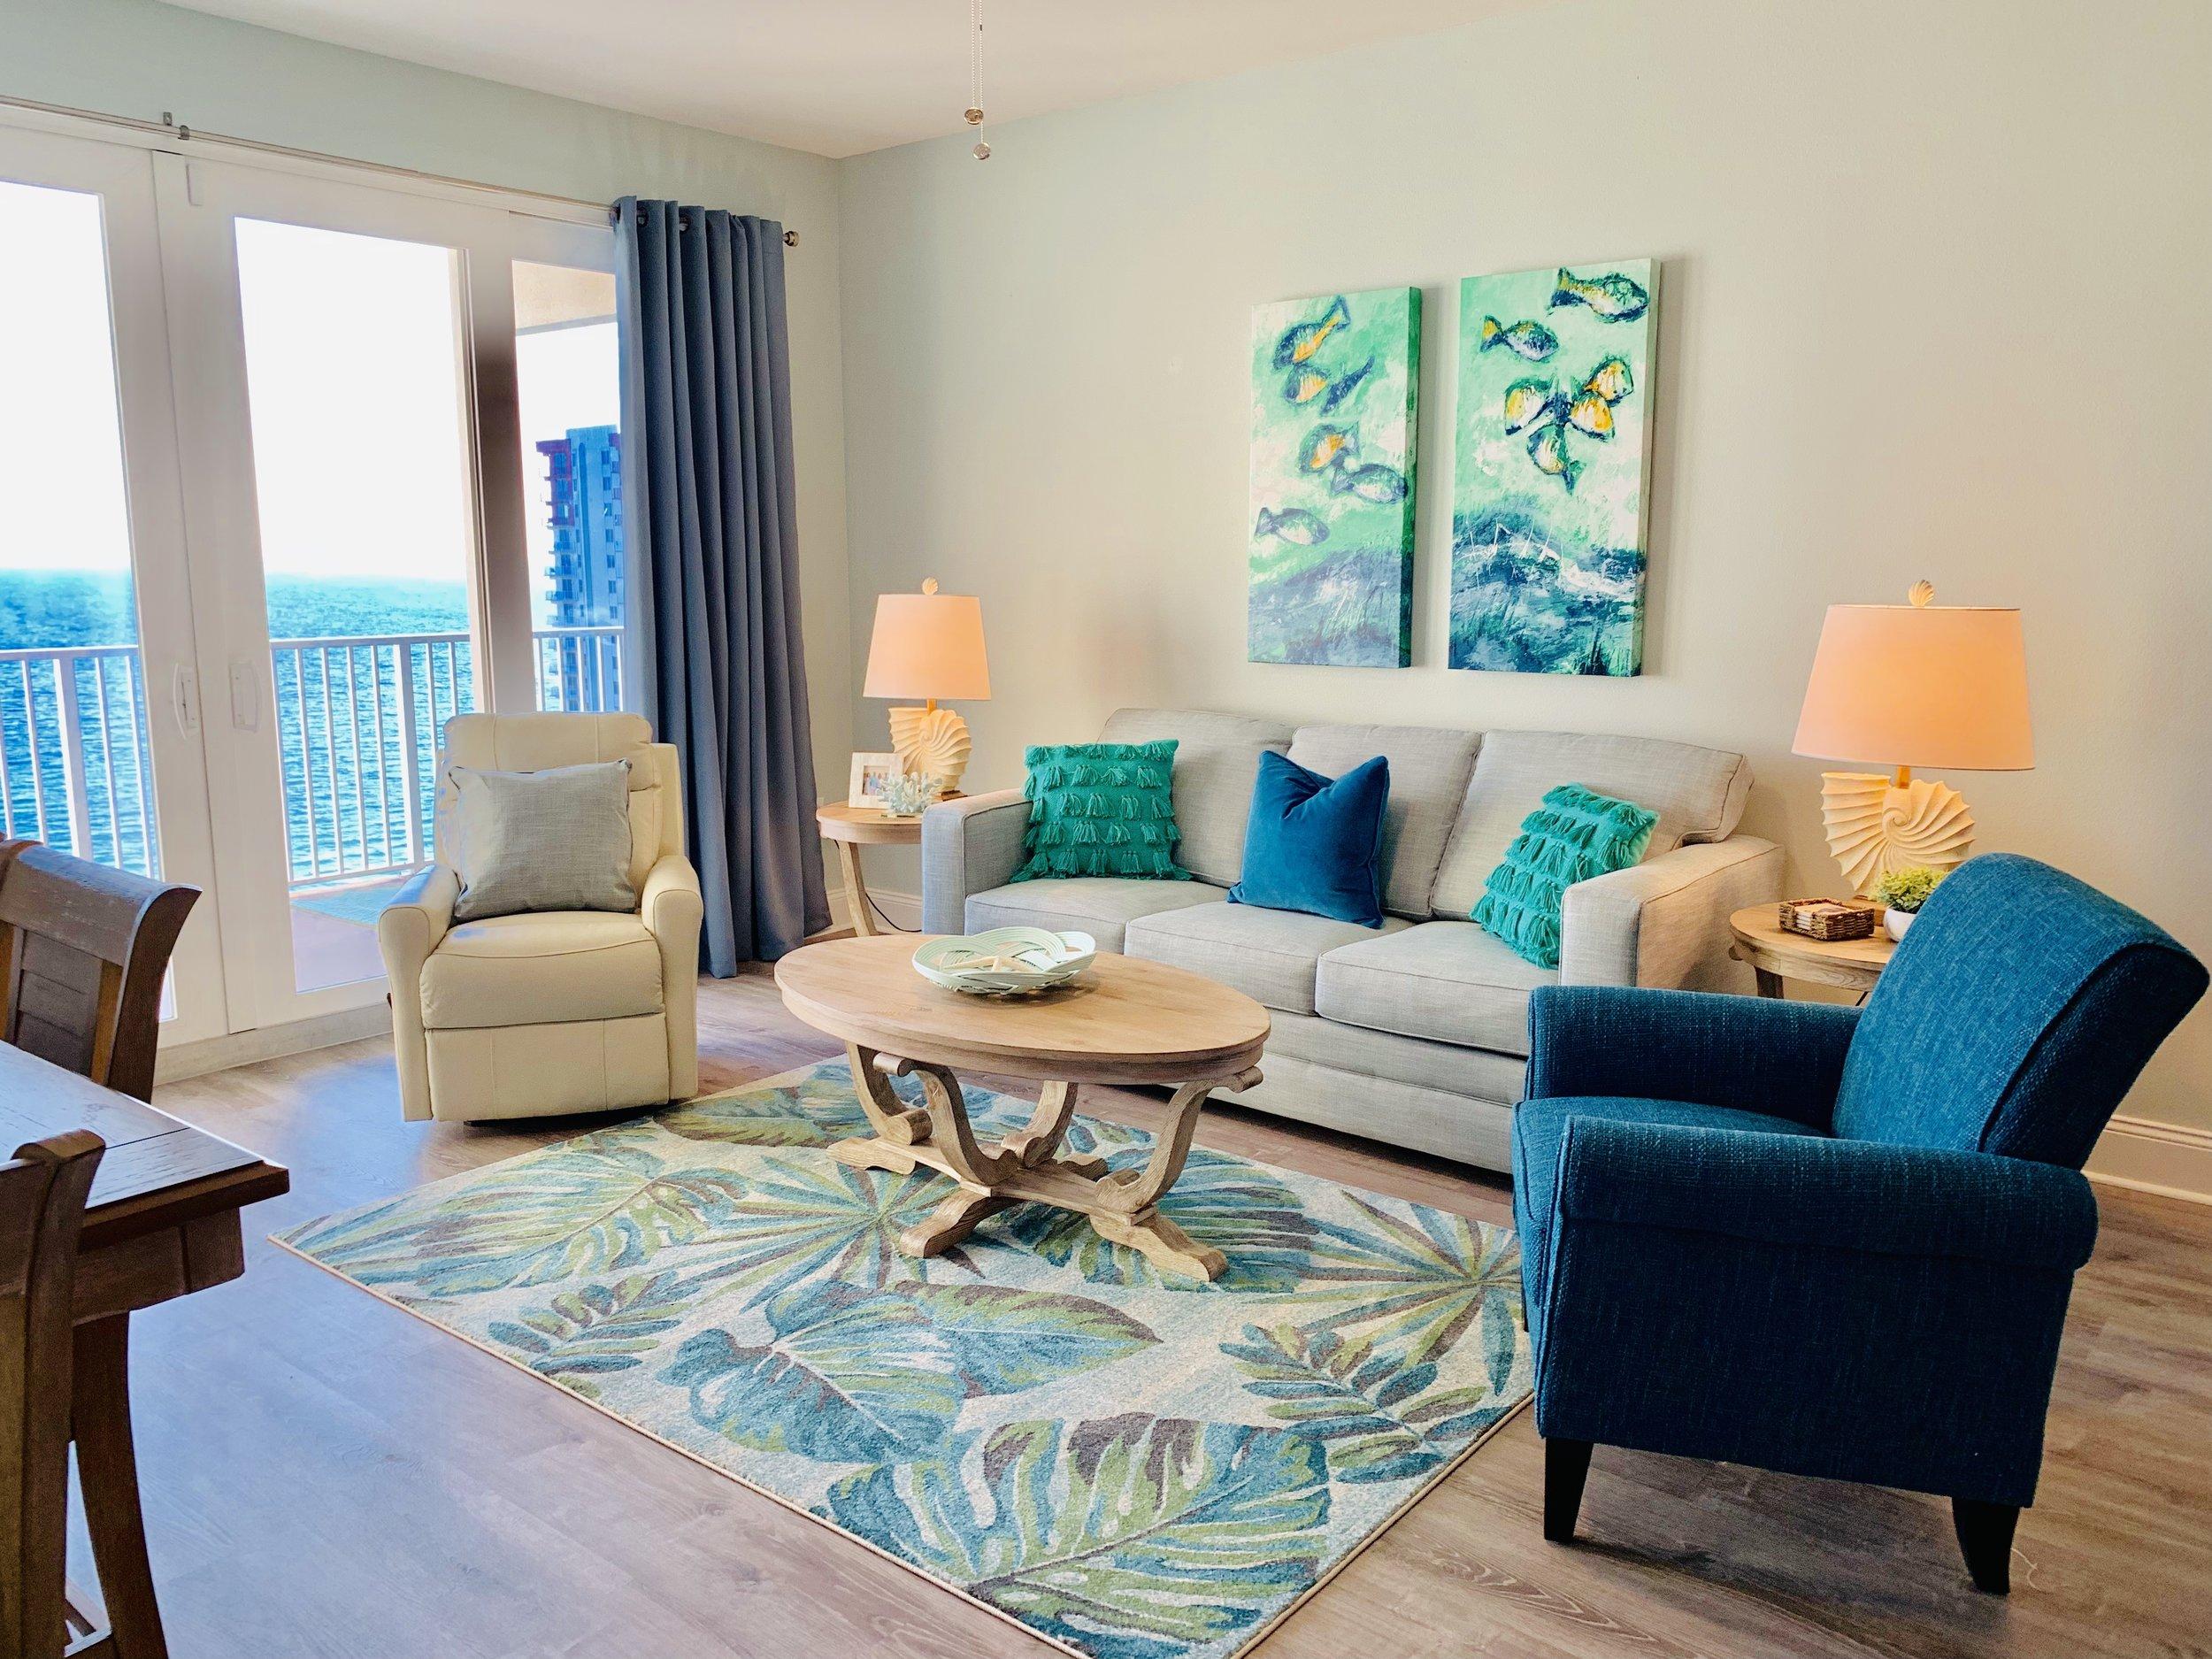 Living Room furniture.jpg